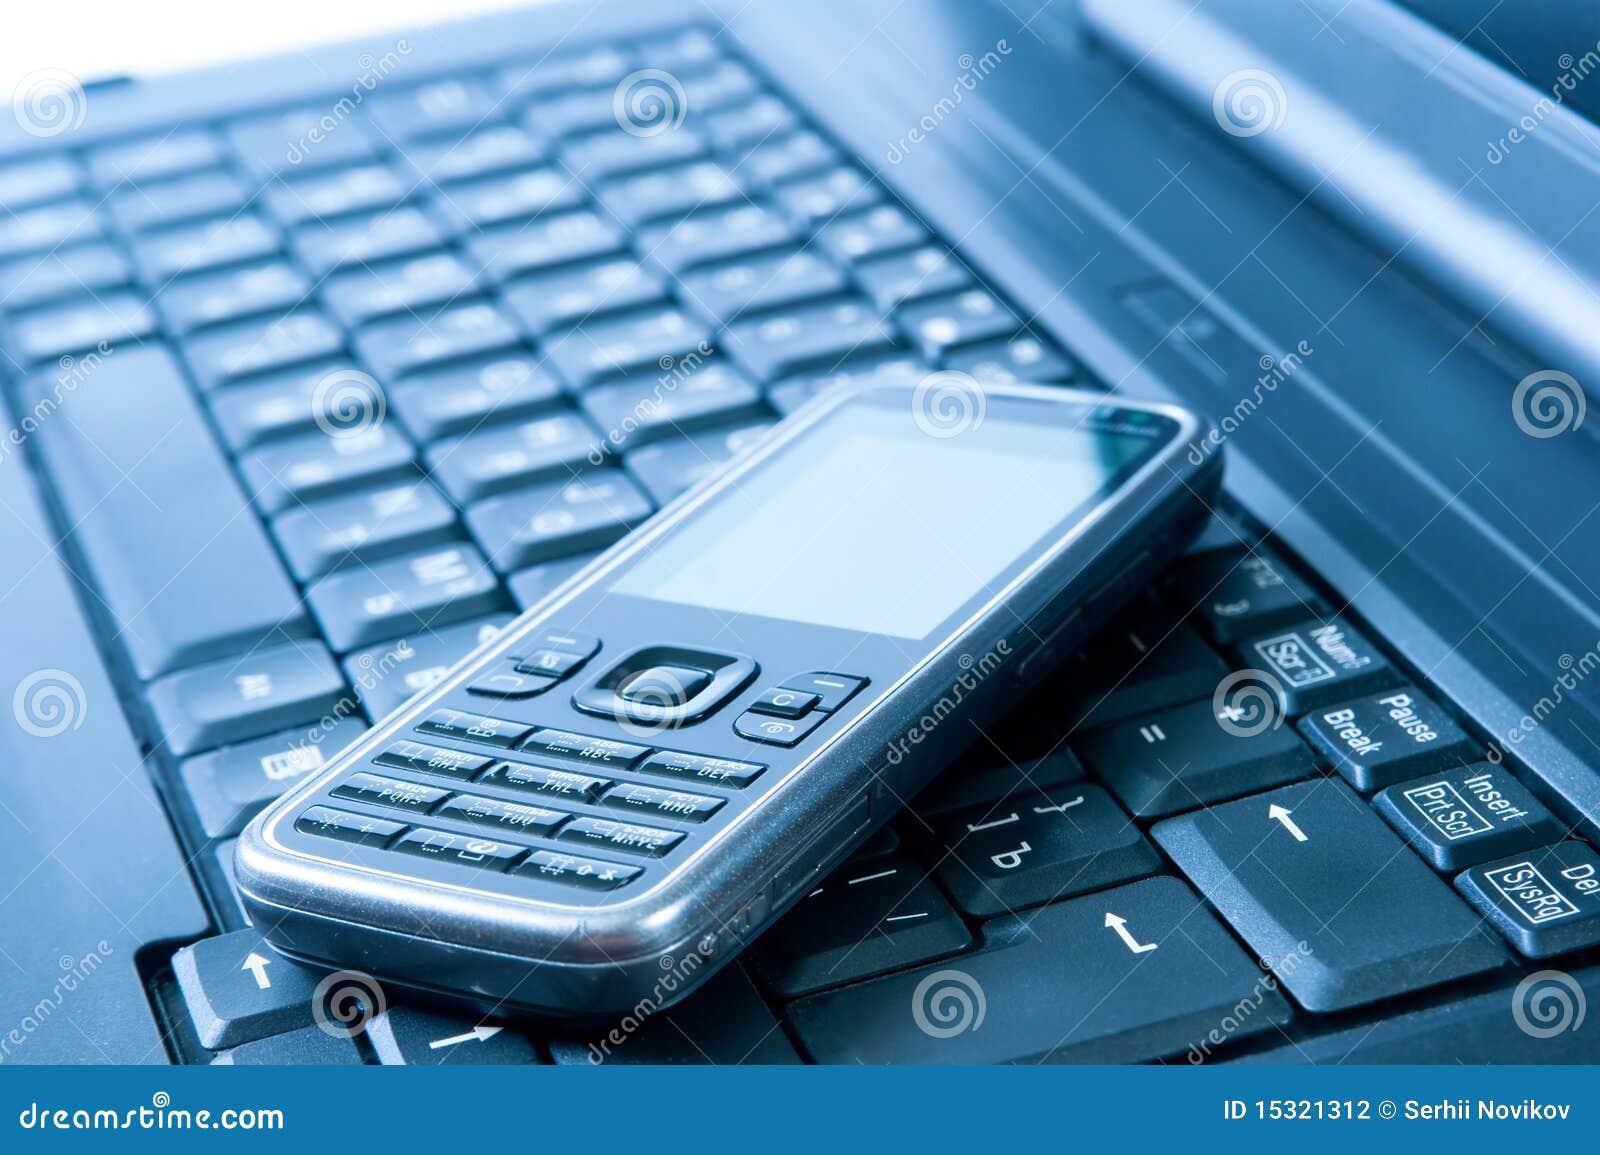 mobile telephone stock photography image 15321312. Black Bedroom Furniture Sets. Home Design Ideas